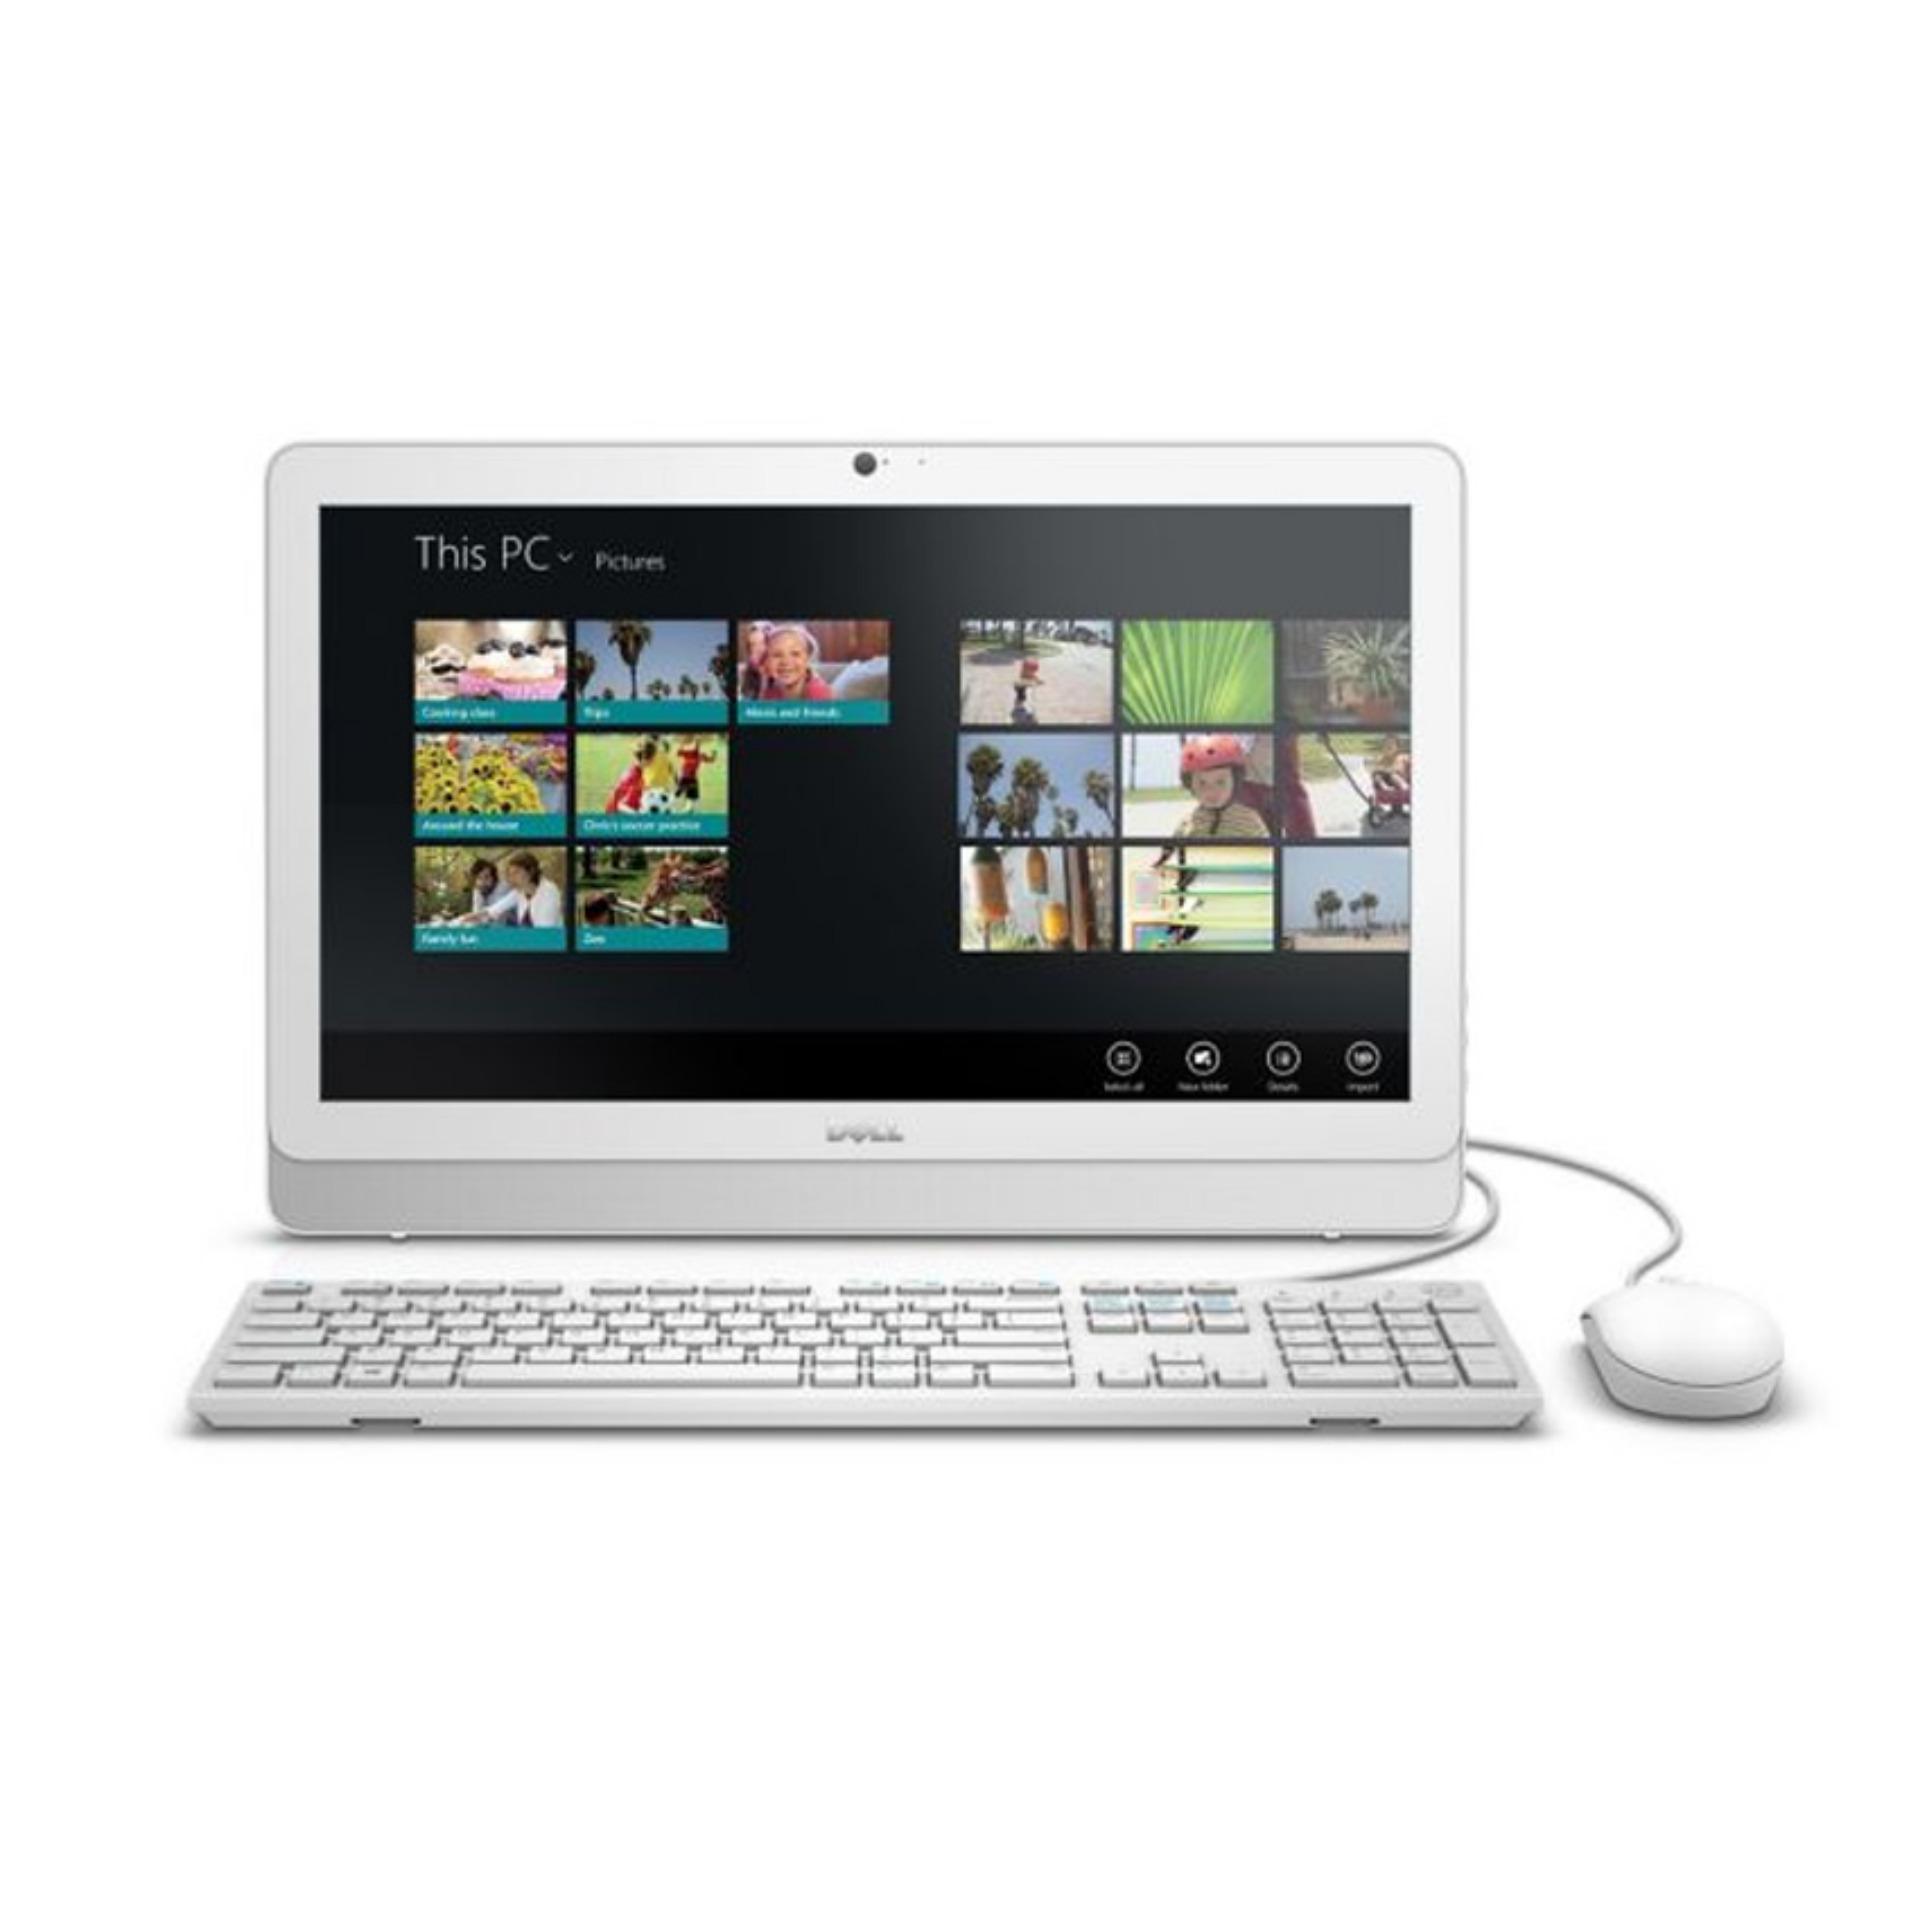 INSPIRON 20 MODEL 3052 New Intel Celeron J3160 4GB RAM 500GB 20 inch HD Anti Glare LED Backlit Display